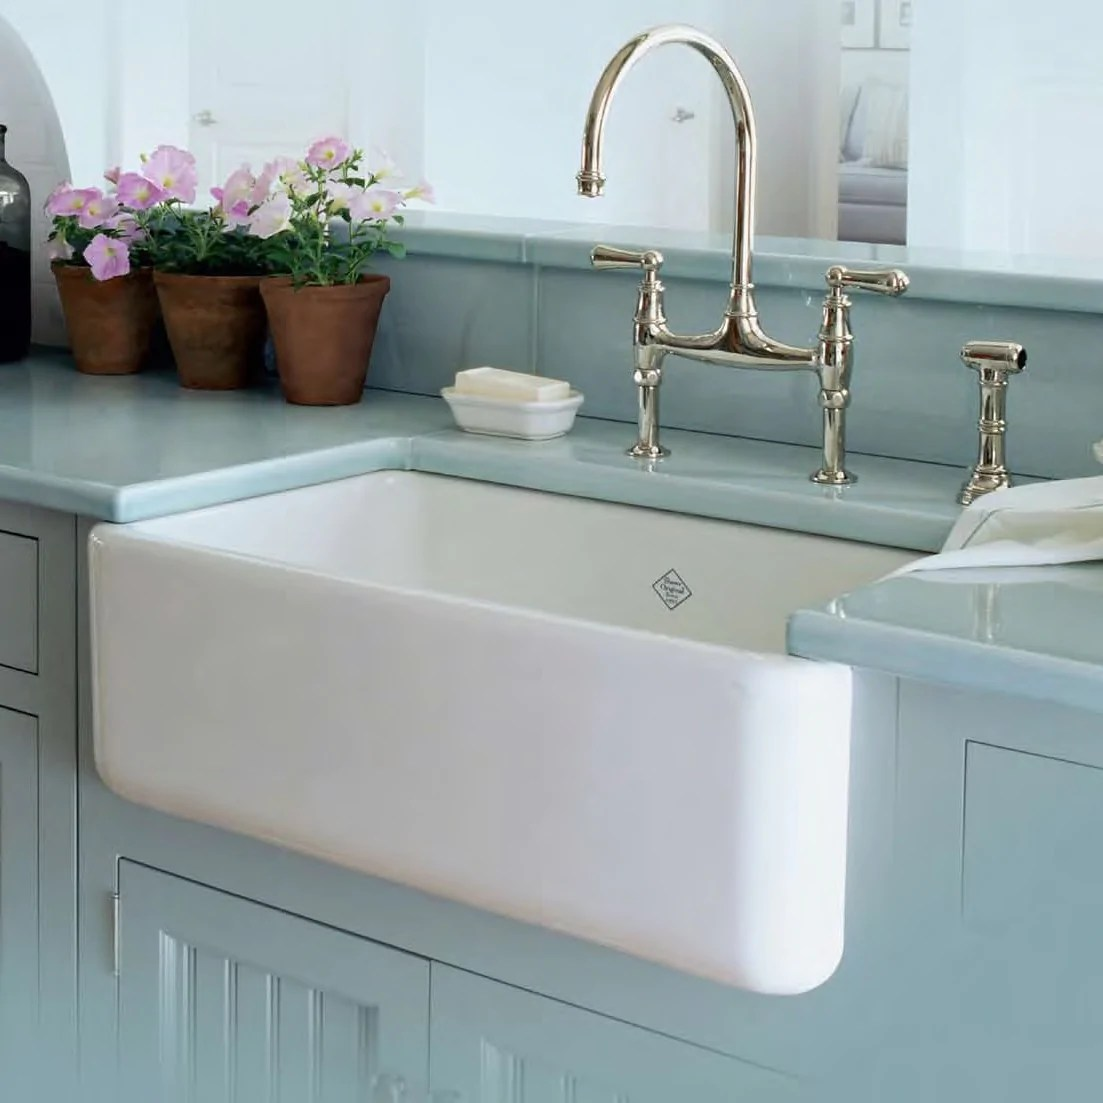 rohl shaws 30 fireclay single bowl thick farmhouse apron kitchen sink white rc3018wh